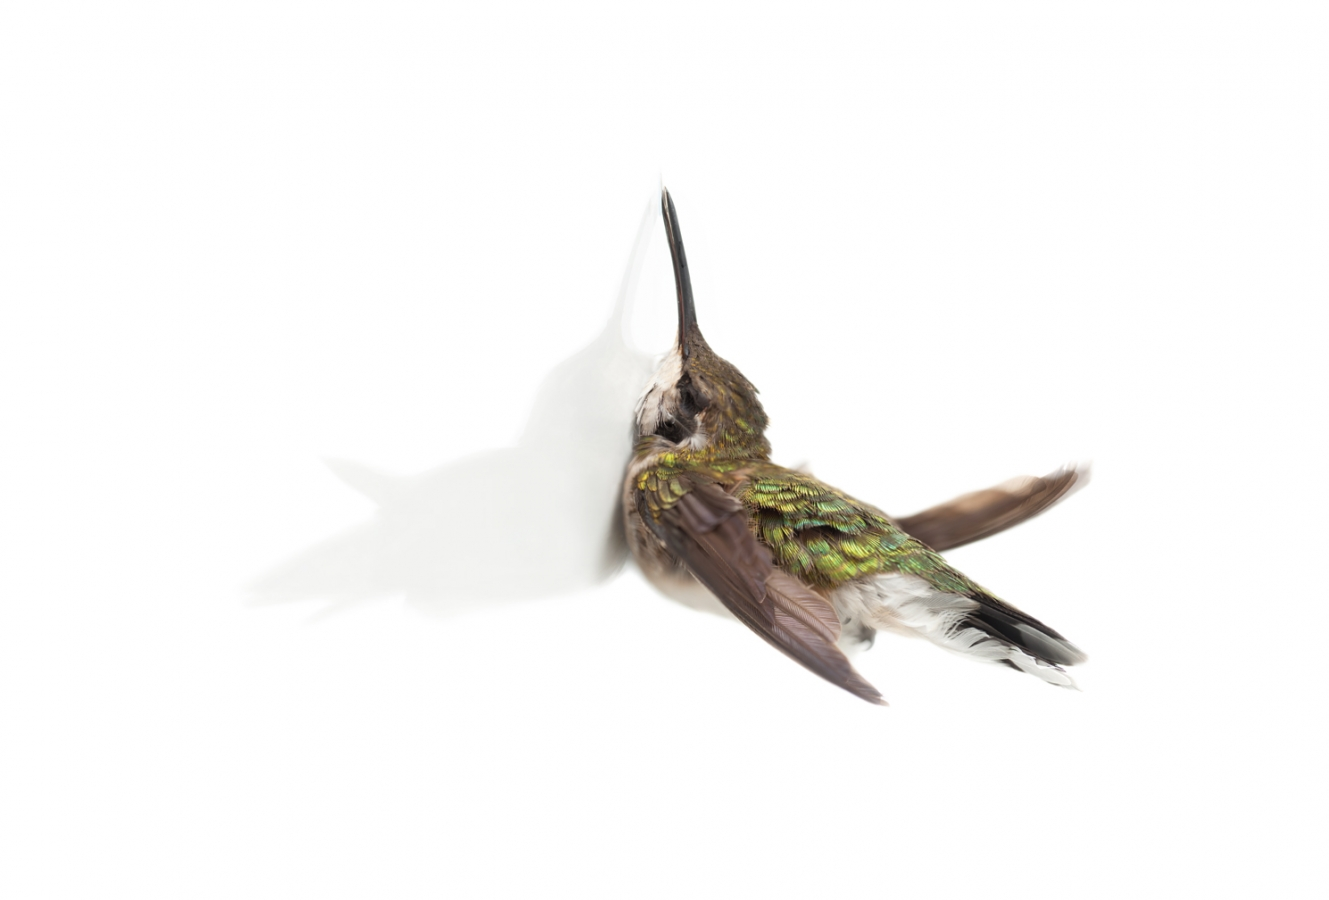 'Impact (Ruby-throated Hummingbird)' - Miranda Brandon